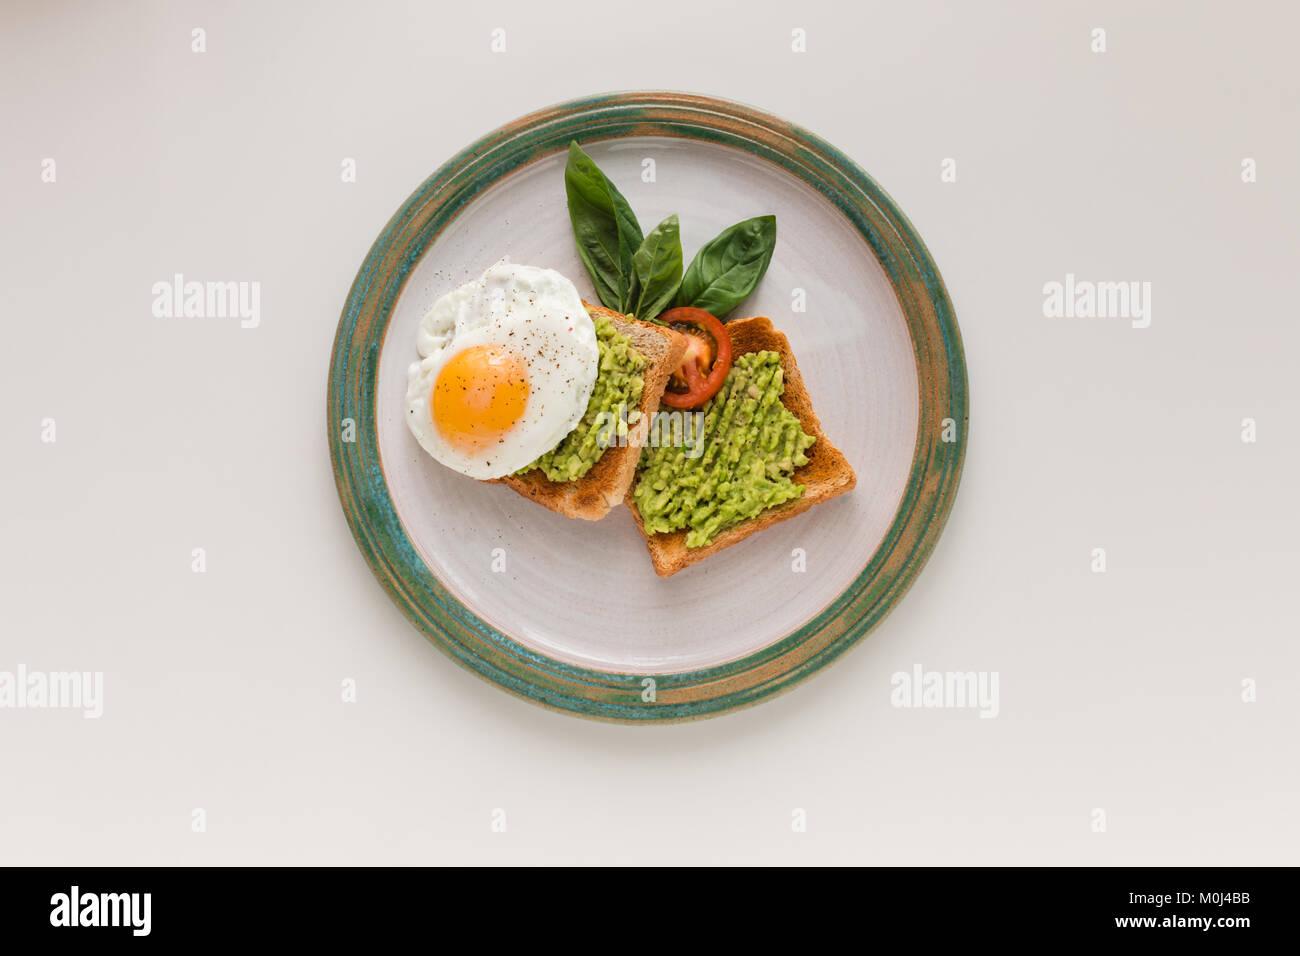 fried egg and avocado on toasts - Stock Image